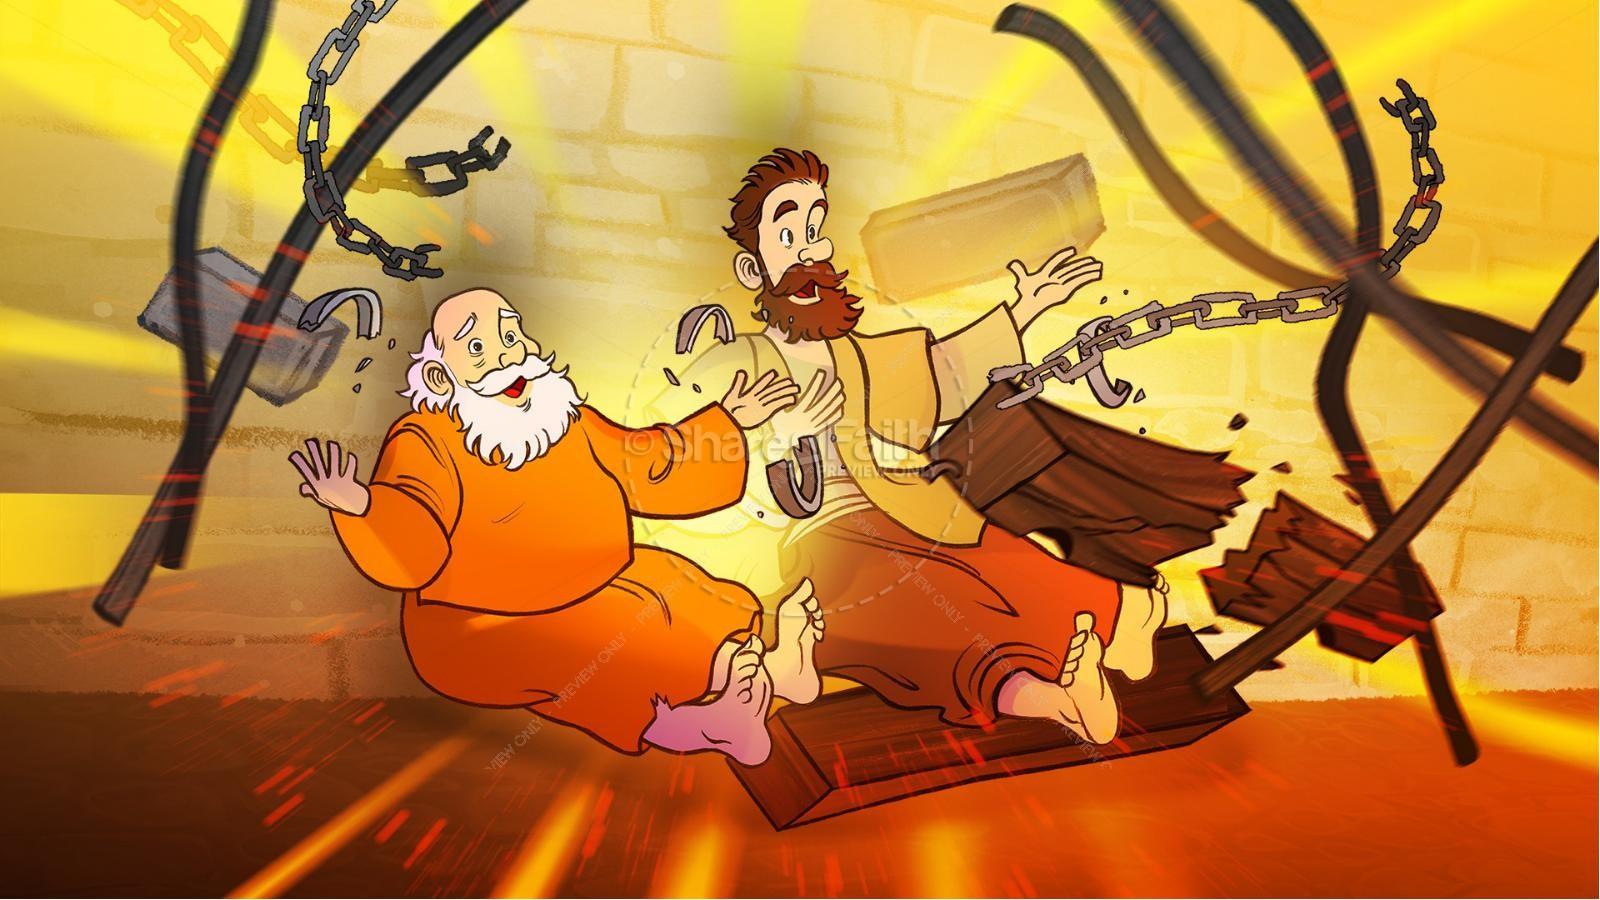 Acts 16 Prison Break Kids Bible Story | slide 6